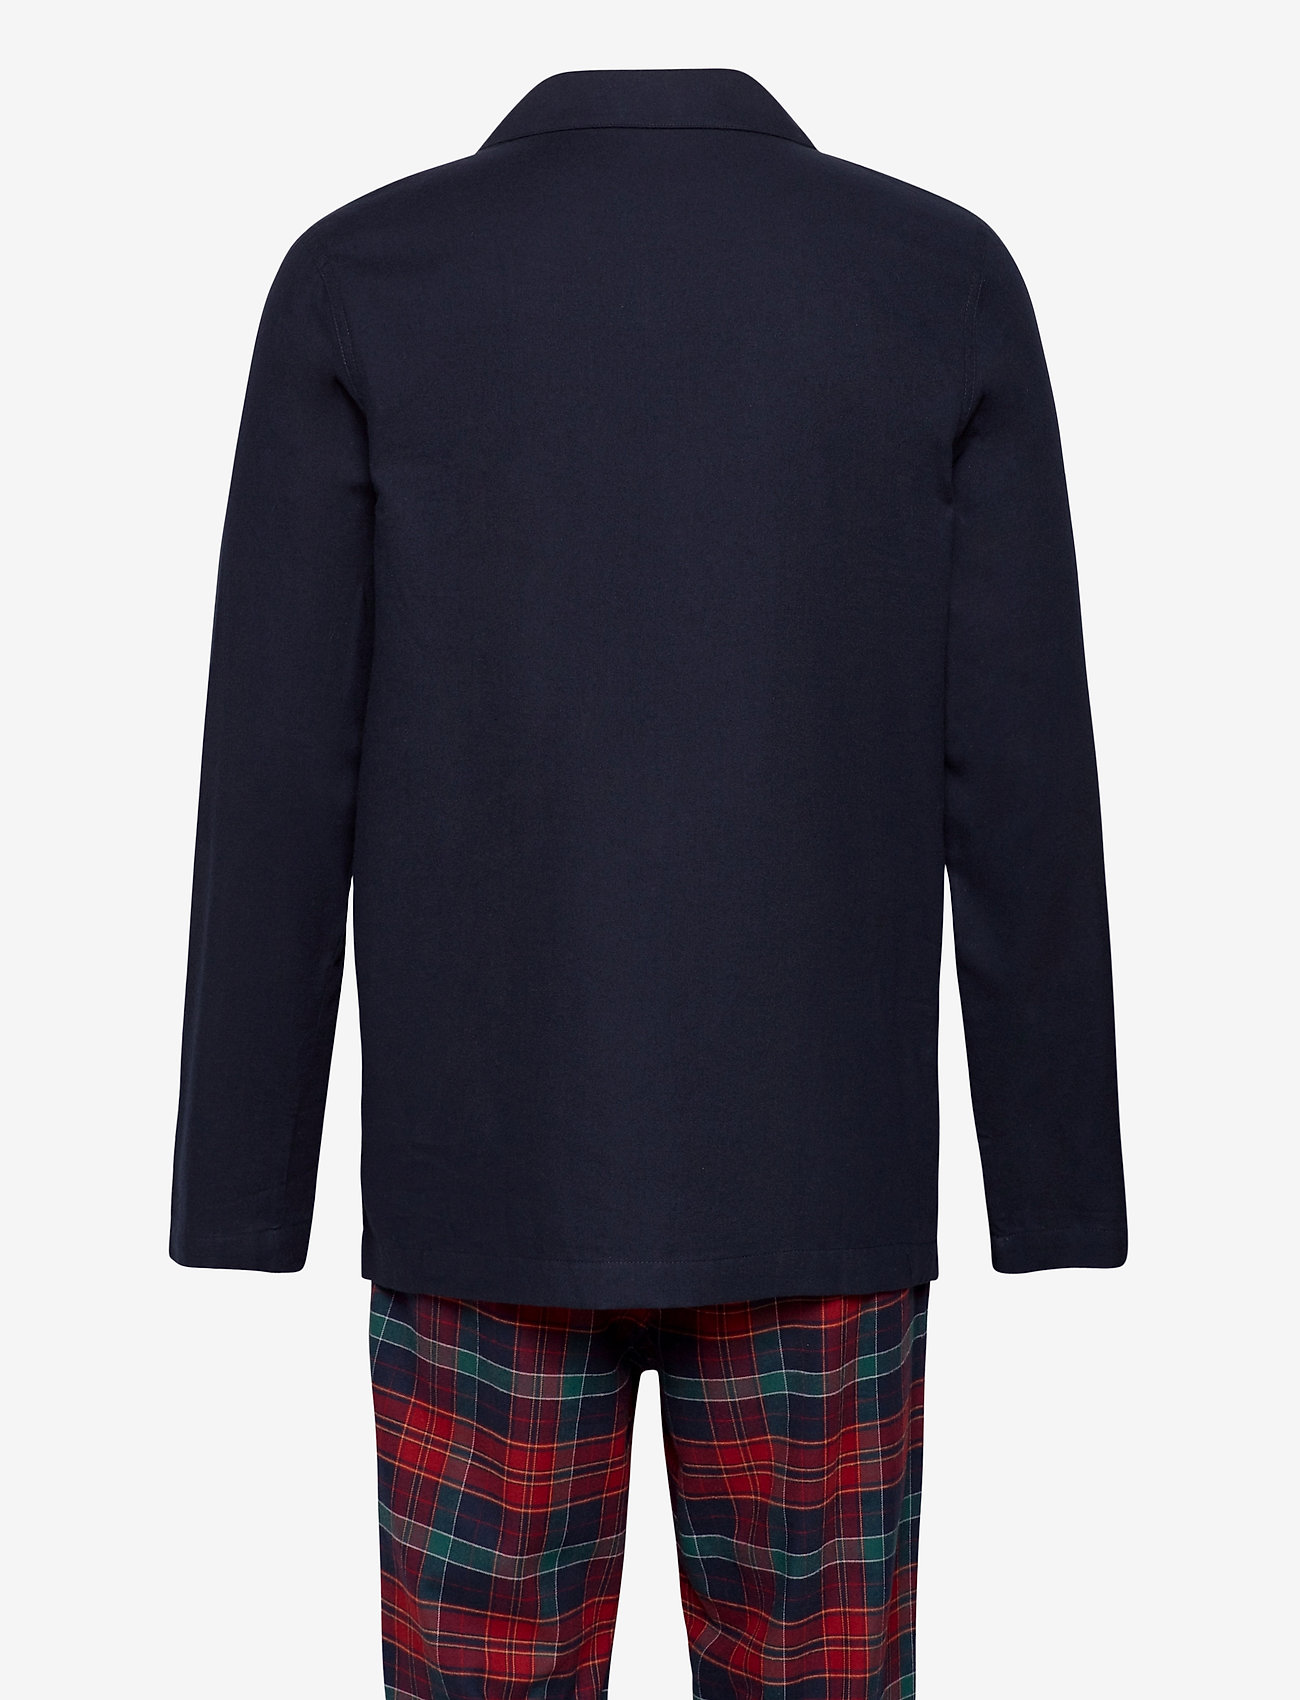 Tommy Hilfiger - LS PANT FLANNEL SHIRT SET - pyjamas - desert sky / regatta red - 1